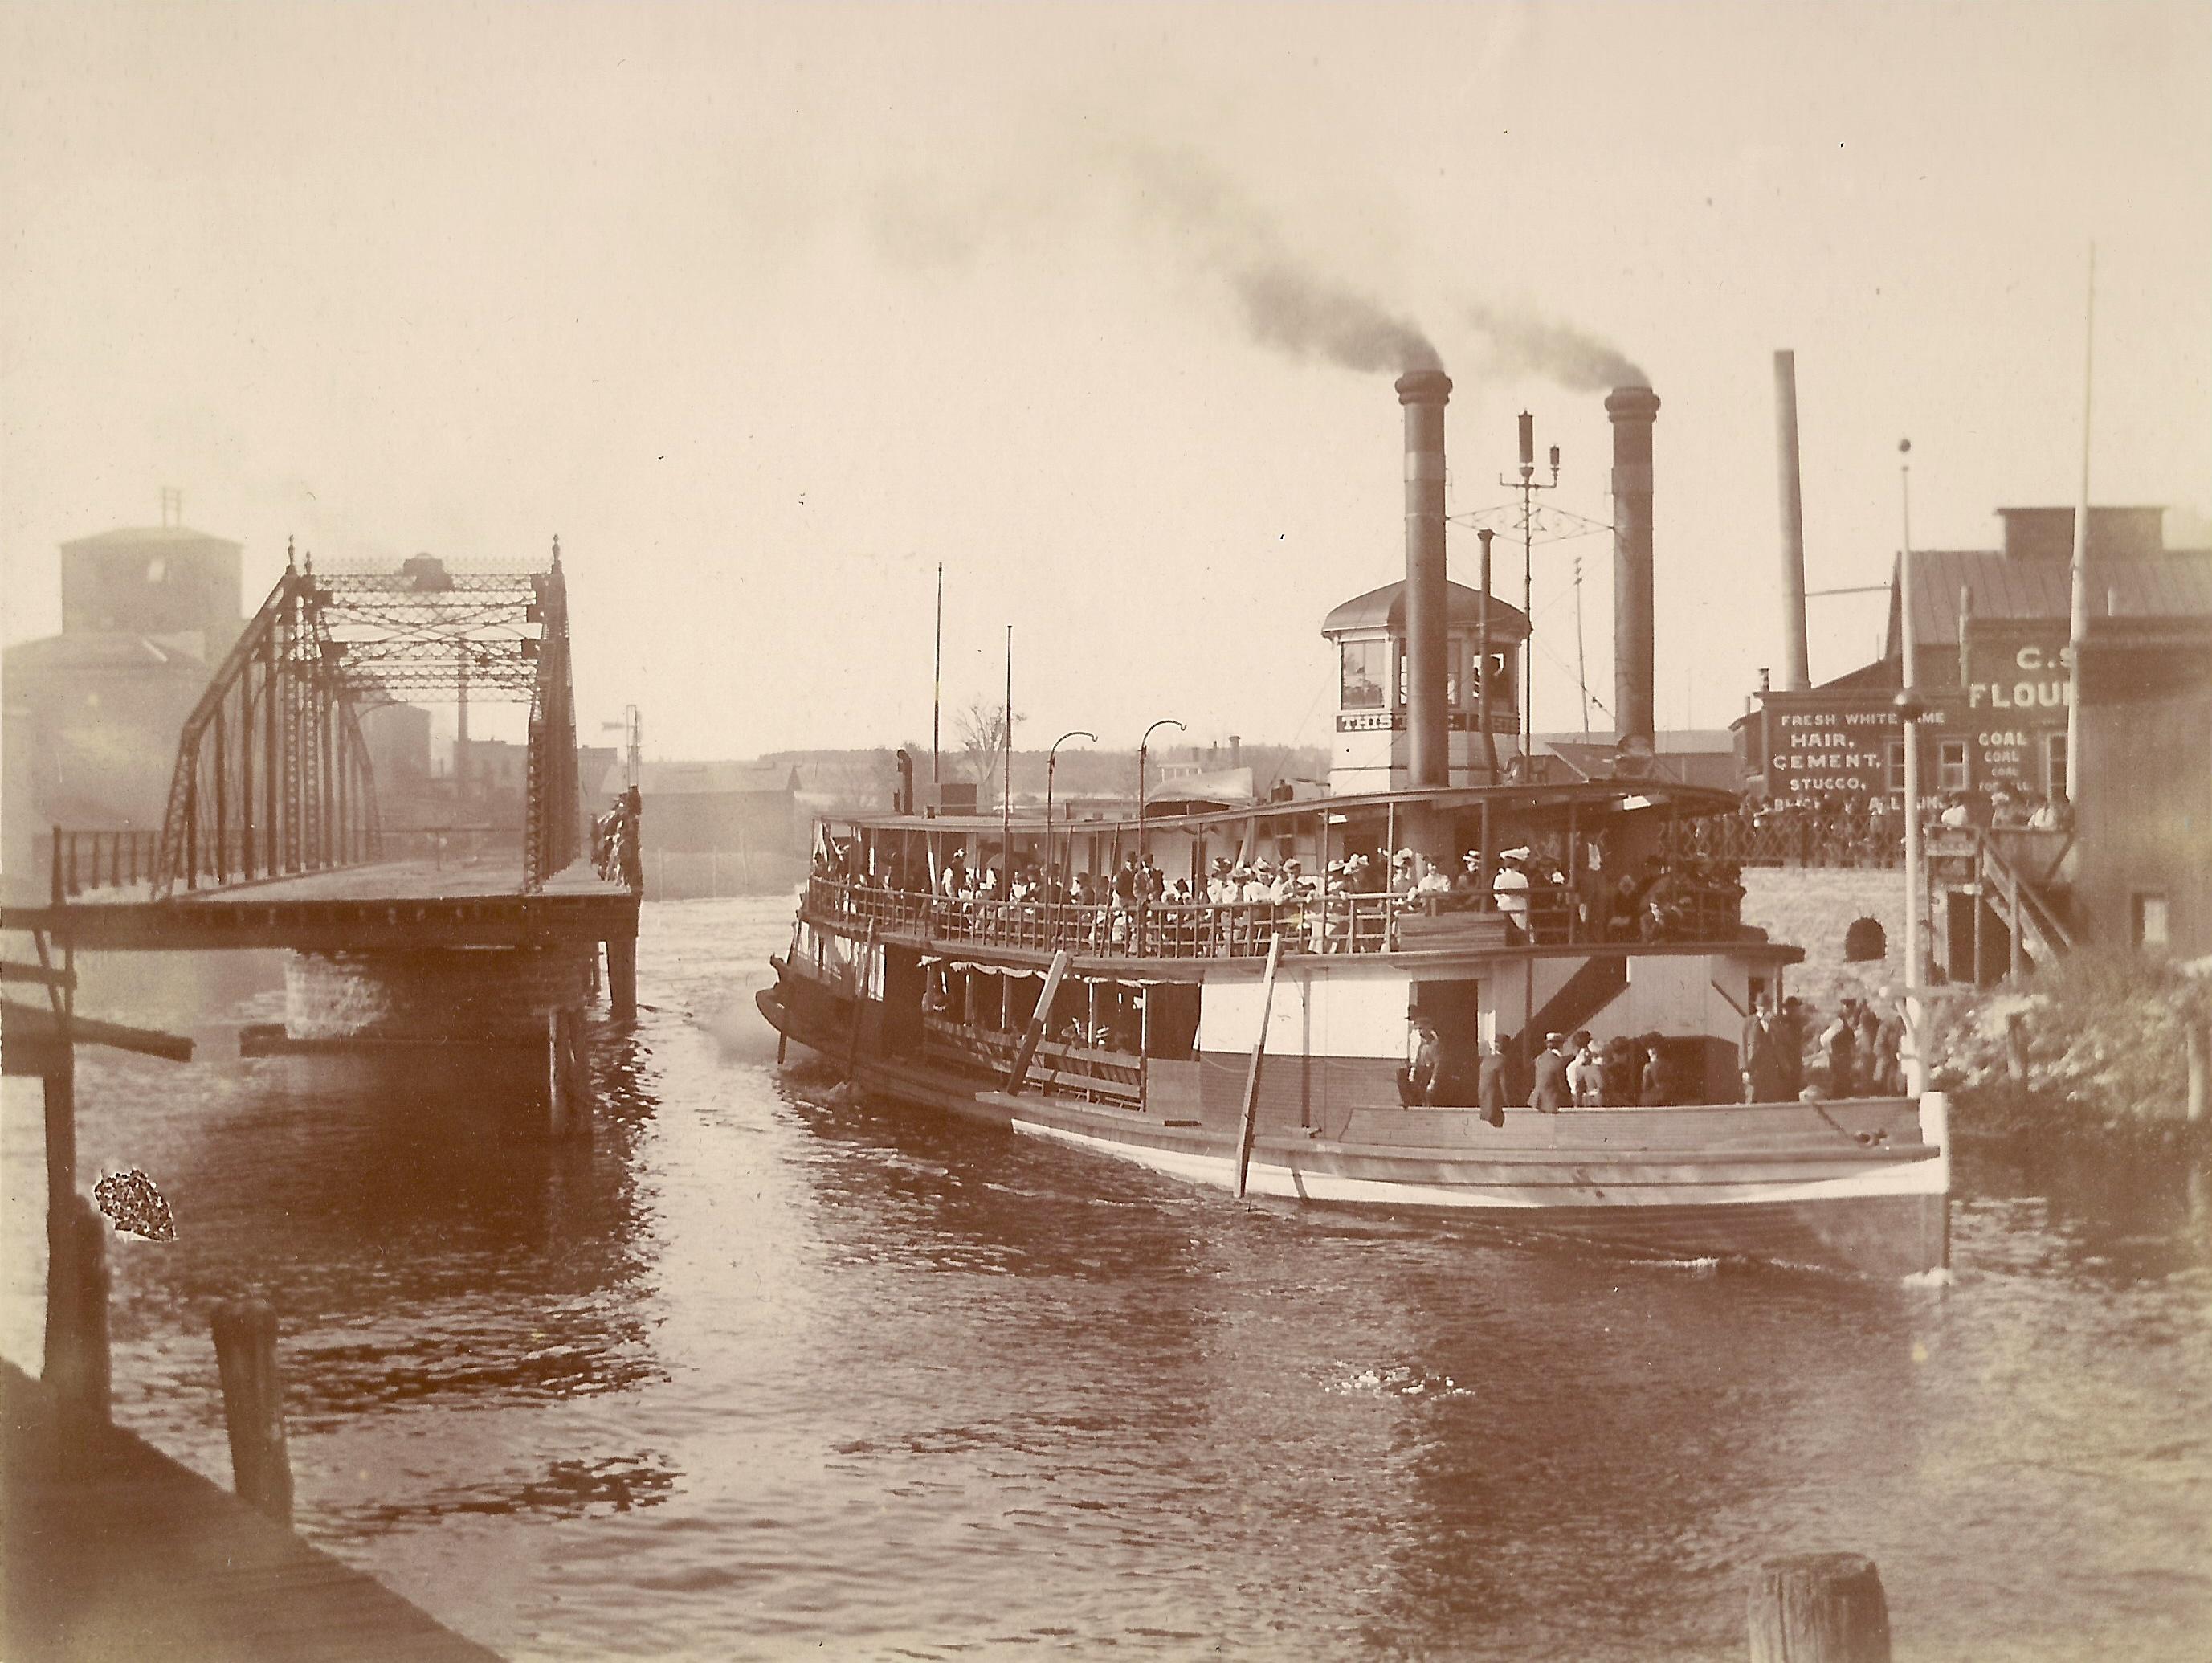 Thistle 1901